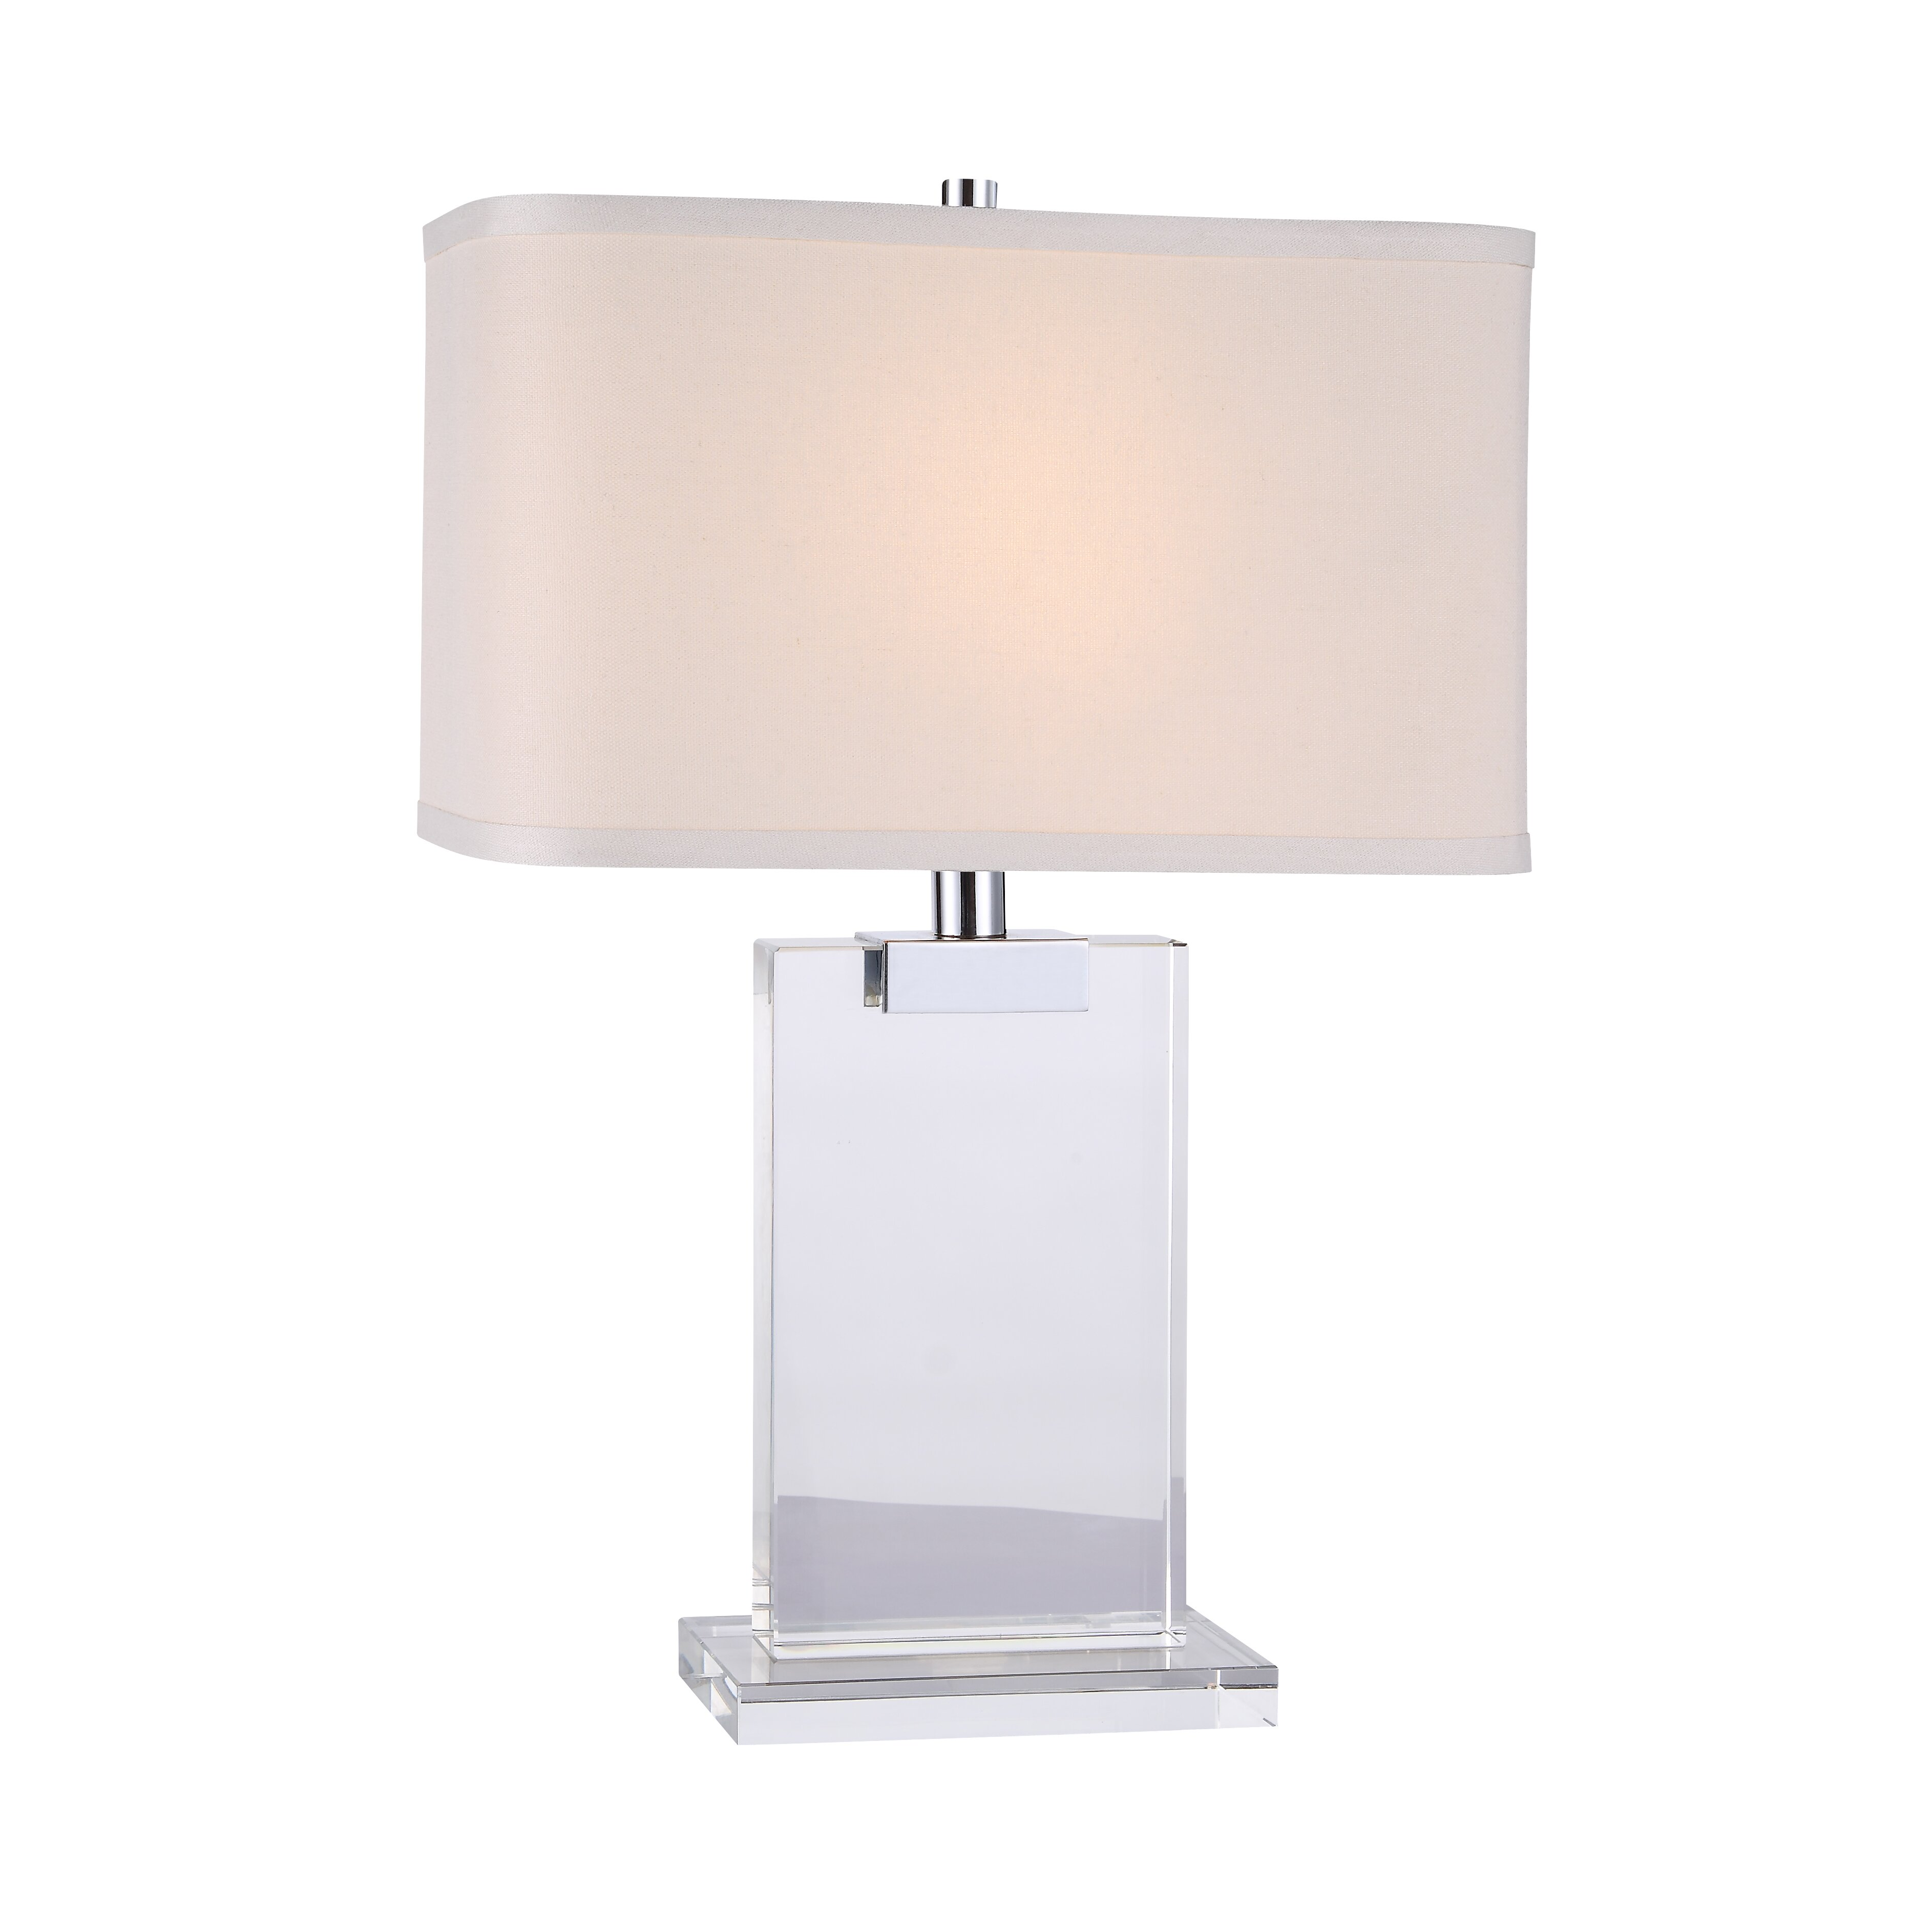 elegant lighting regina table lamp with rectangular shade reviews. Black Bedroom Furniture Sets. Home Design Ideas